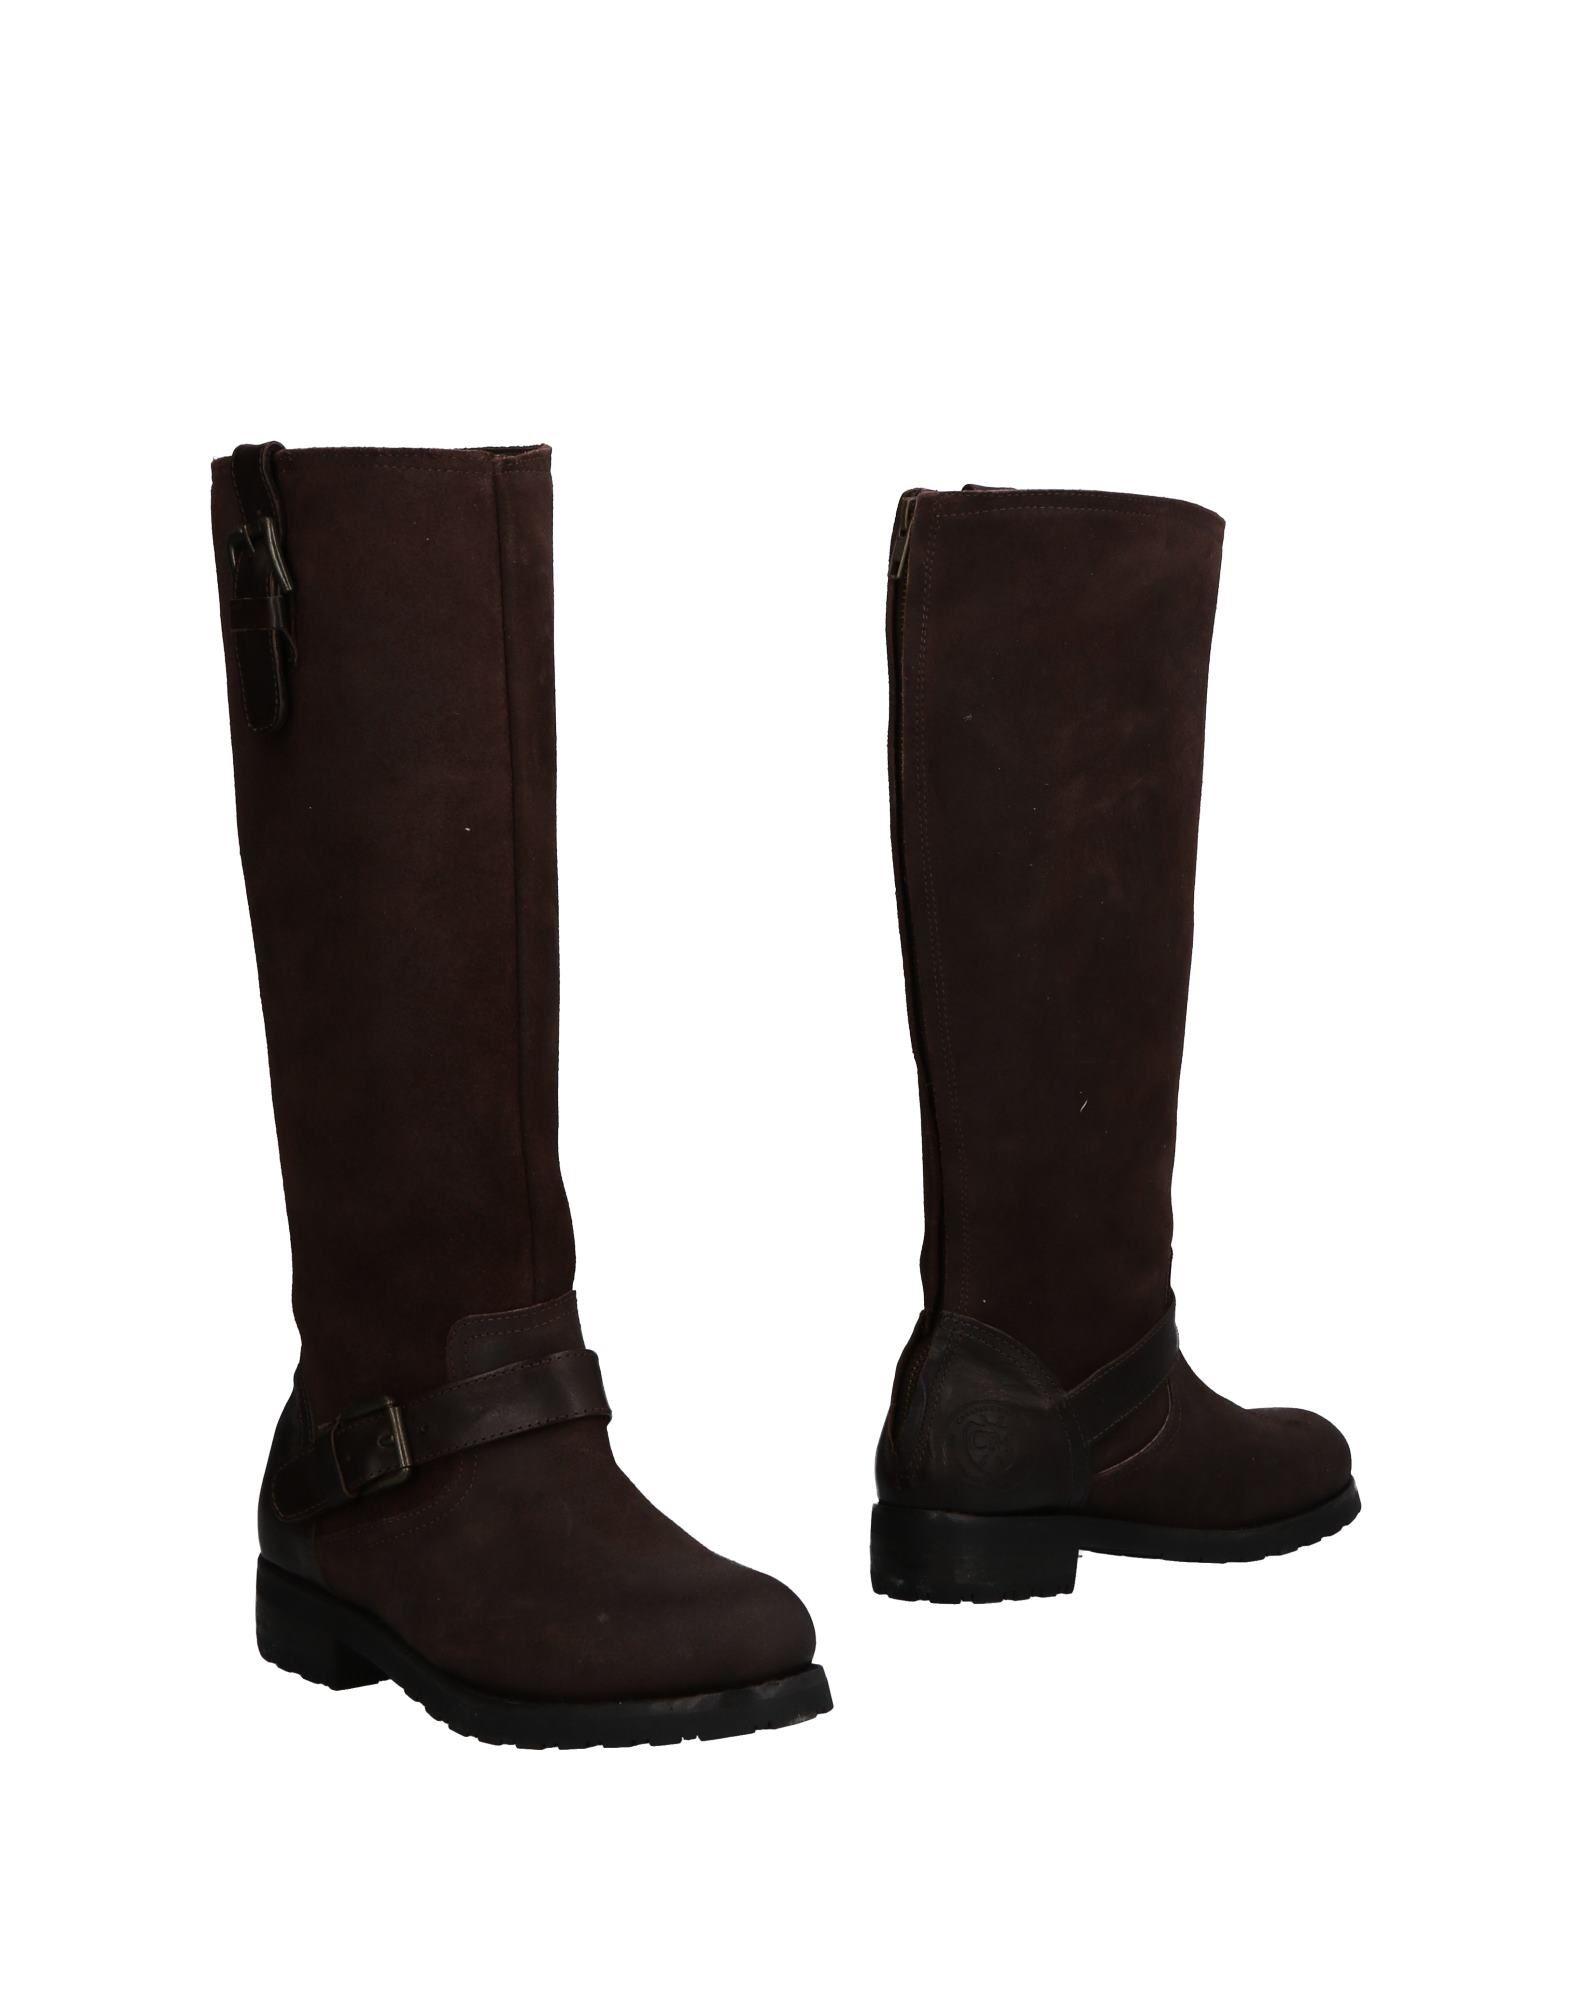 Catarina on Martins Boots - Women Catarina Martins Boots online on Catarina  Canada - 11507280WP 9ab88b